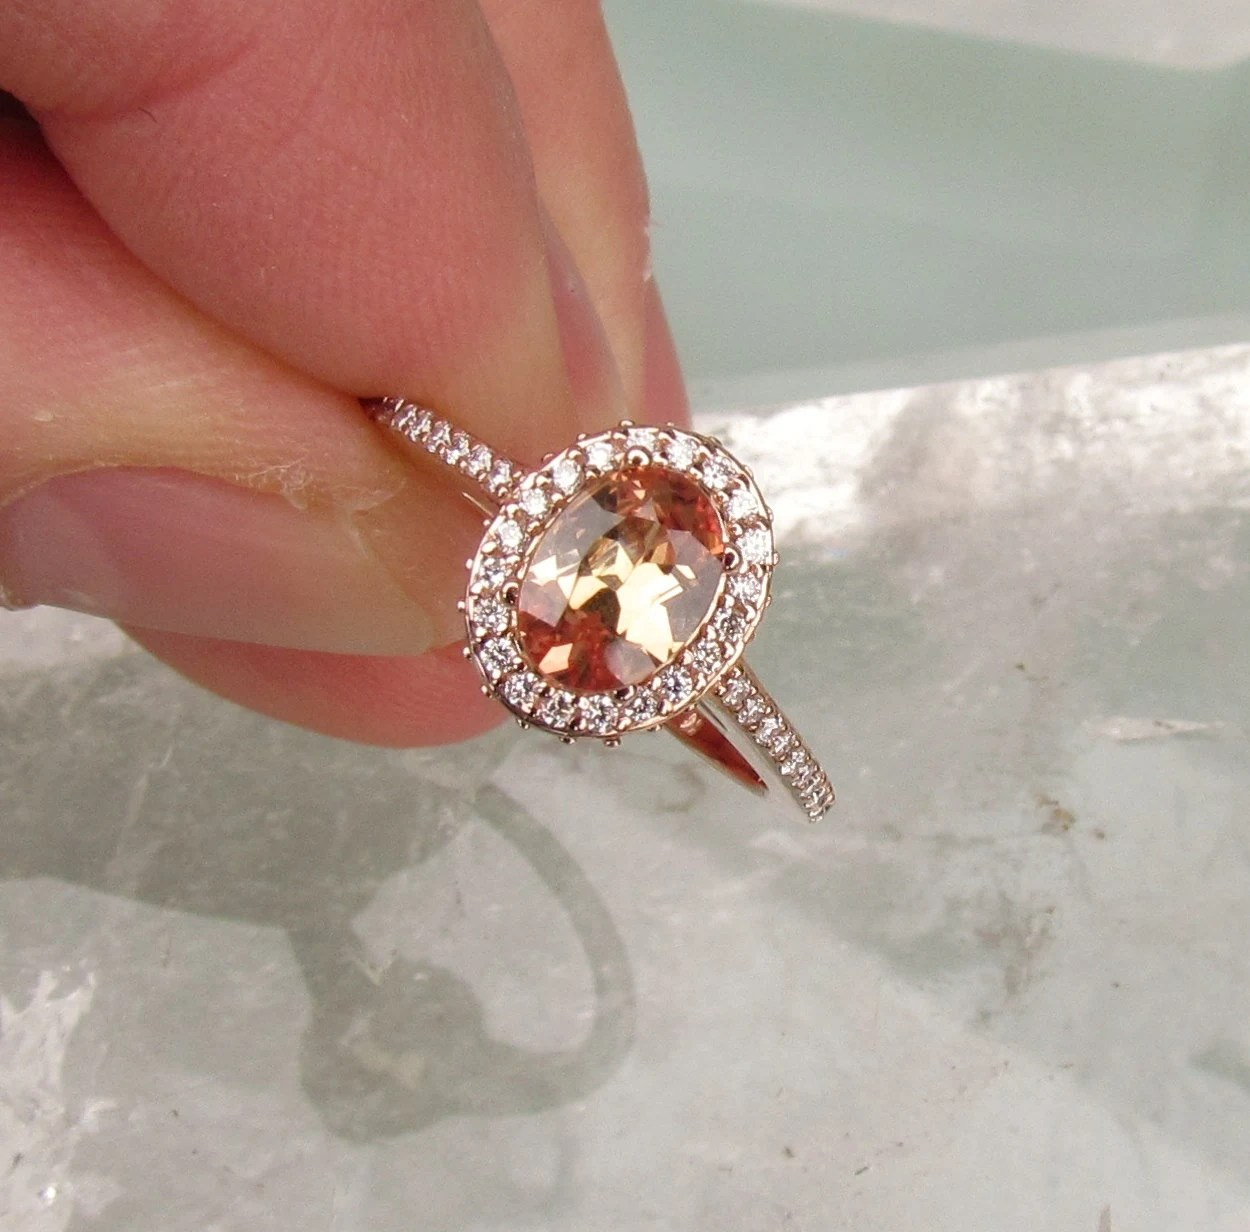 Morganite Rings A Gorgeous Alternative To Pink Diamonds